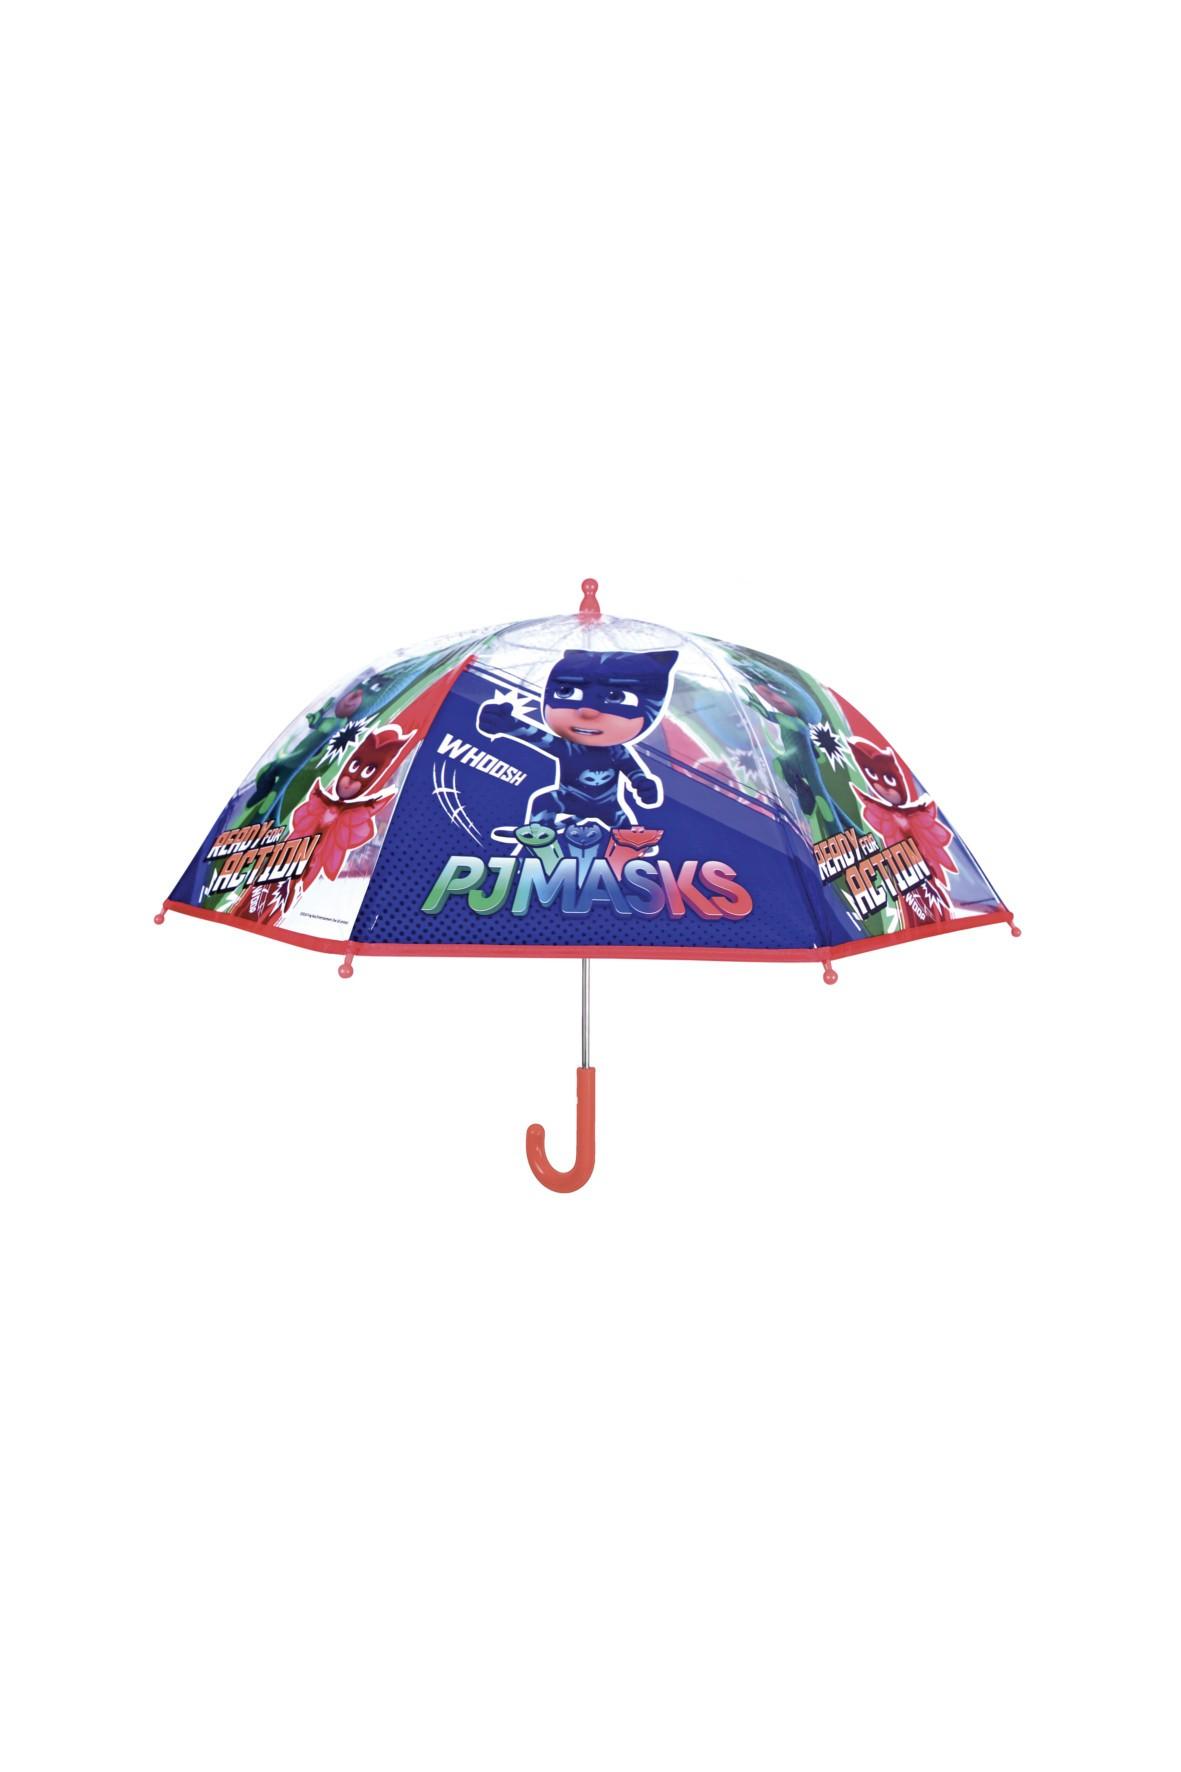 Parasol Pidżamersi